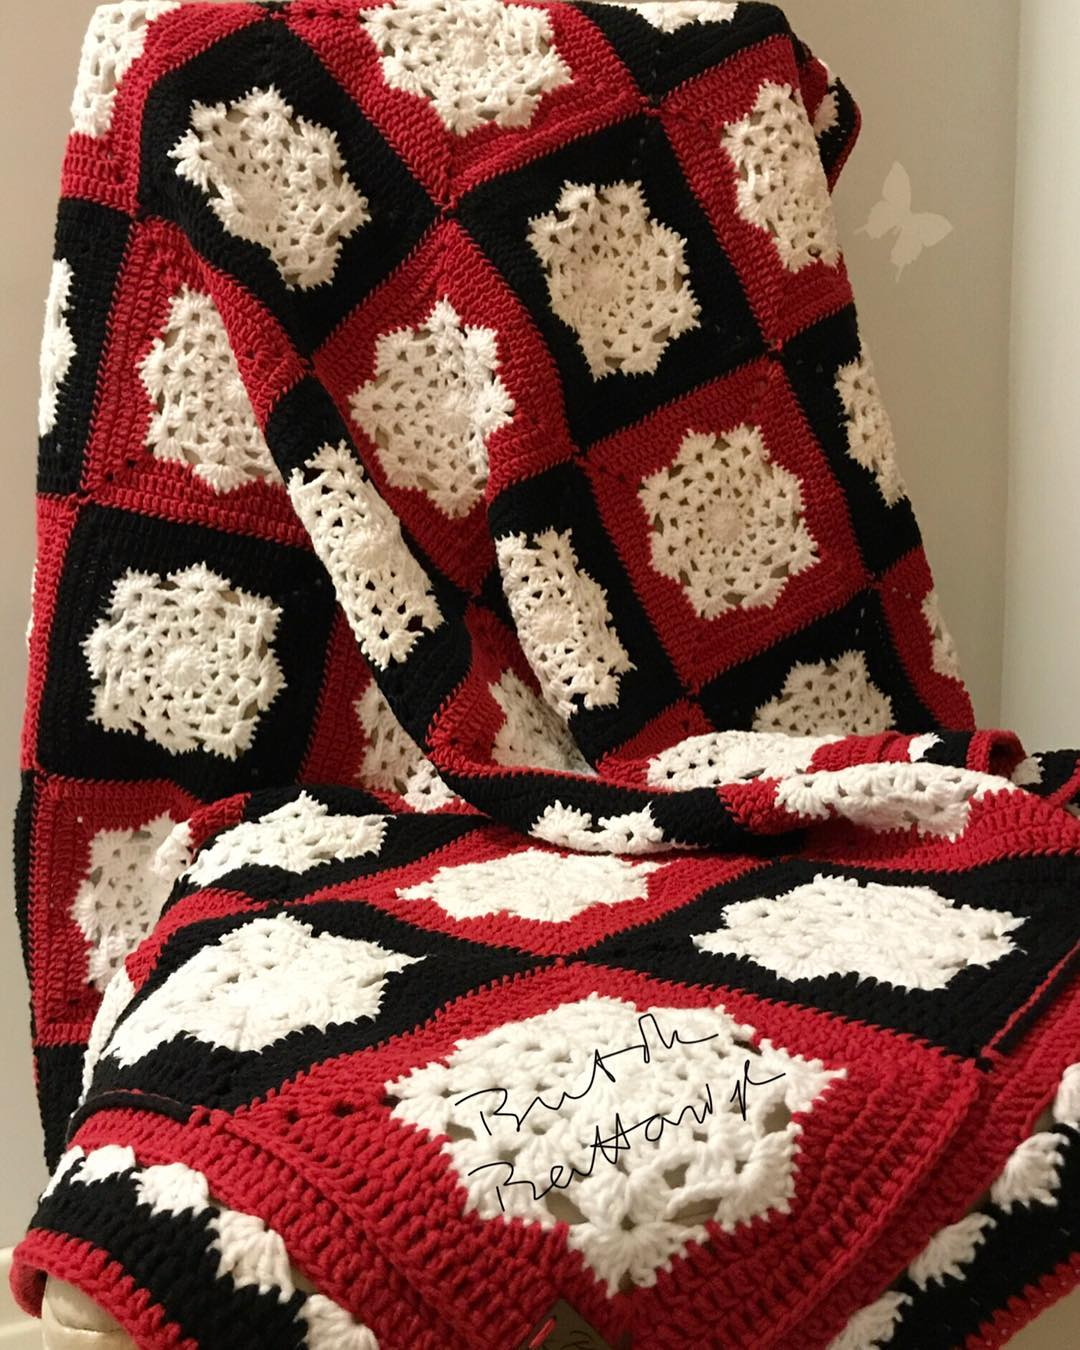 lapny-striped-crochet-pattern-lapghan-stripes